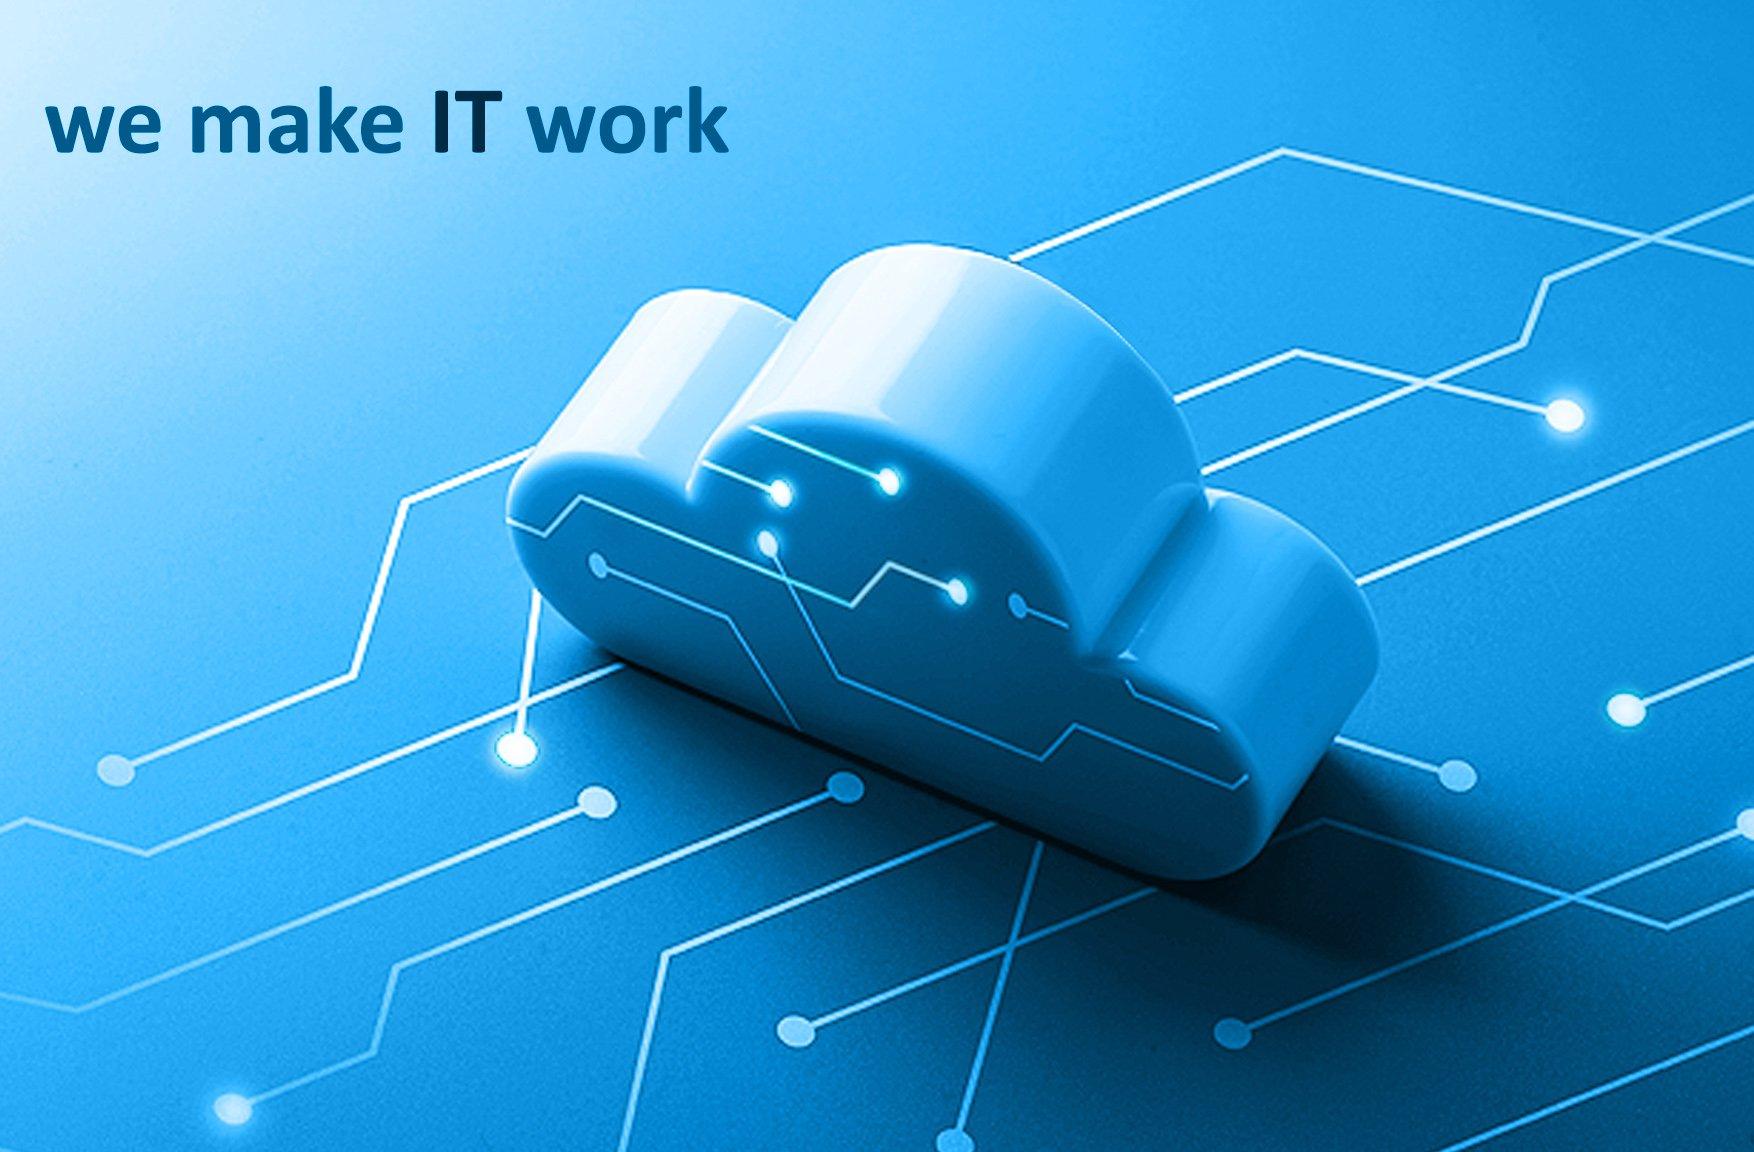 cloud_weMakeITwork_